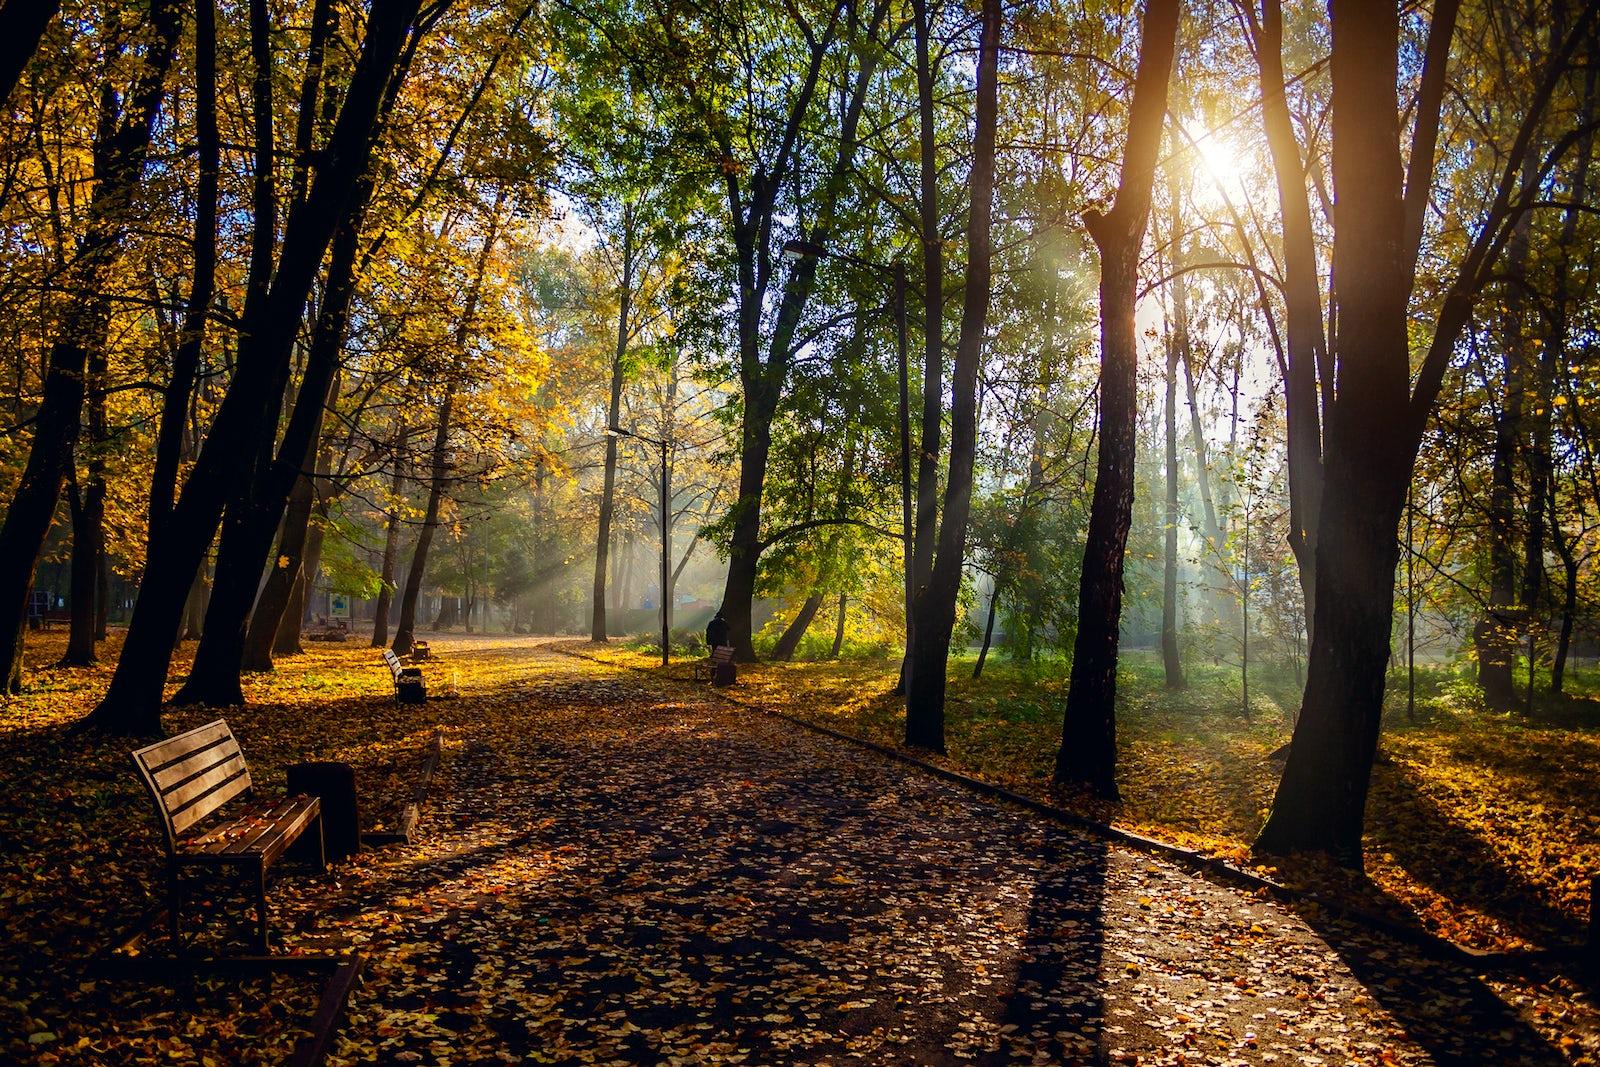 Picture © Credits to iStock/Sergii Zyskо